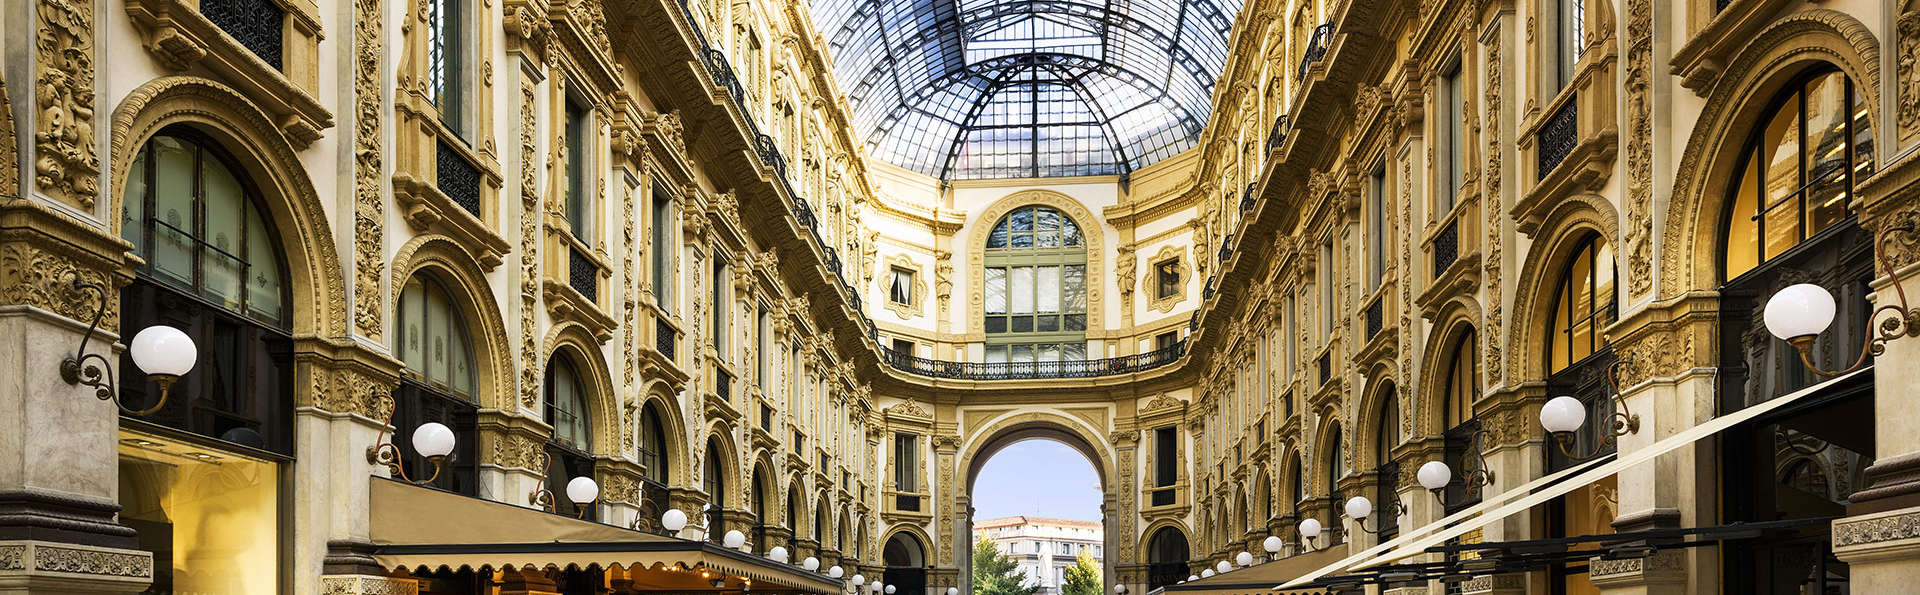 Hotel Da Vinci - EDIT_DESTINATION_01.jpg